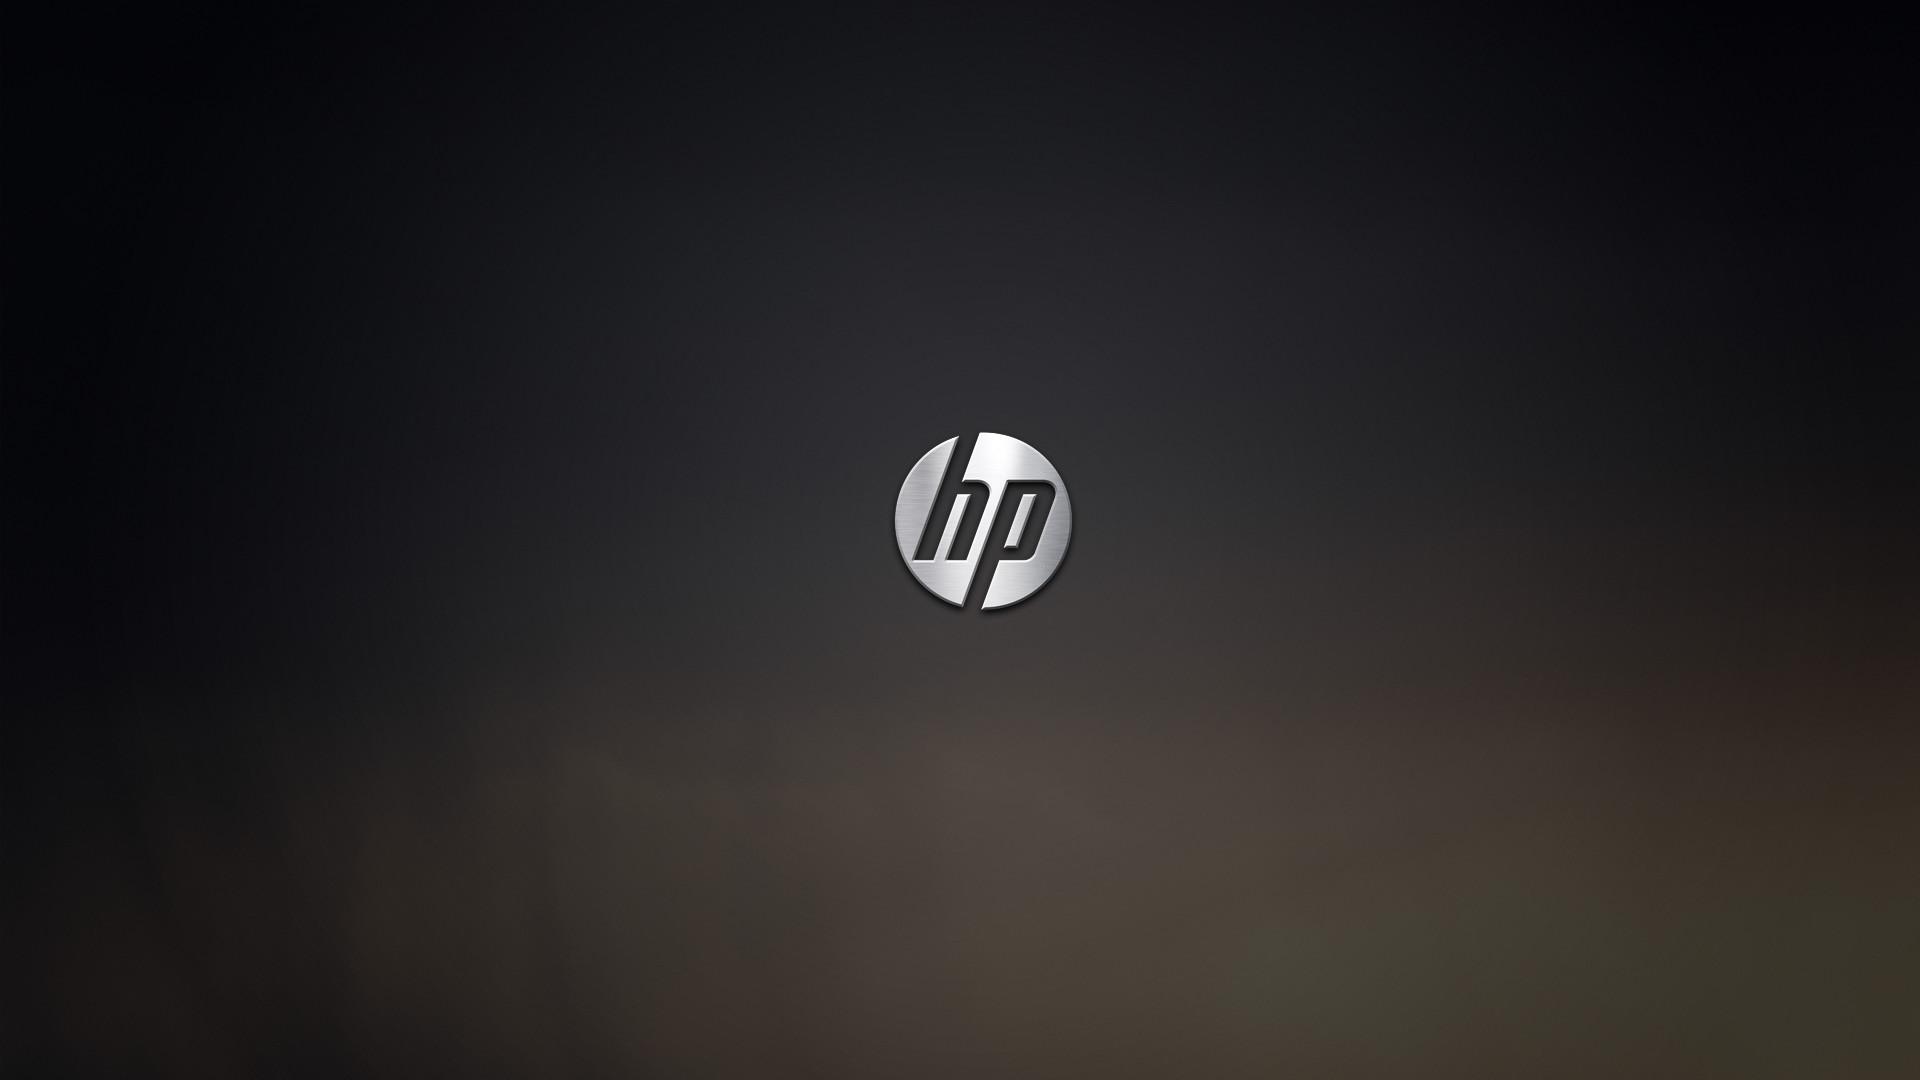 3d Hd Wallpapers For Laptop 1366x768 Hp Wallpaper 1366x768 183 ①